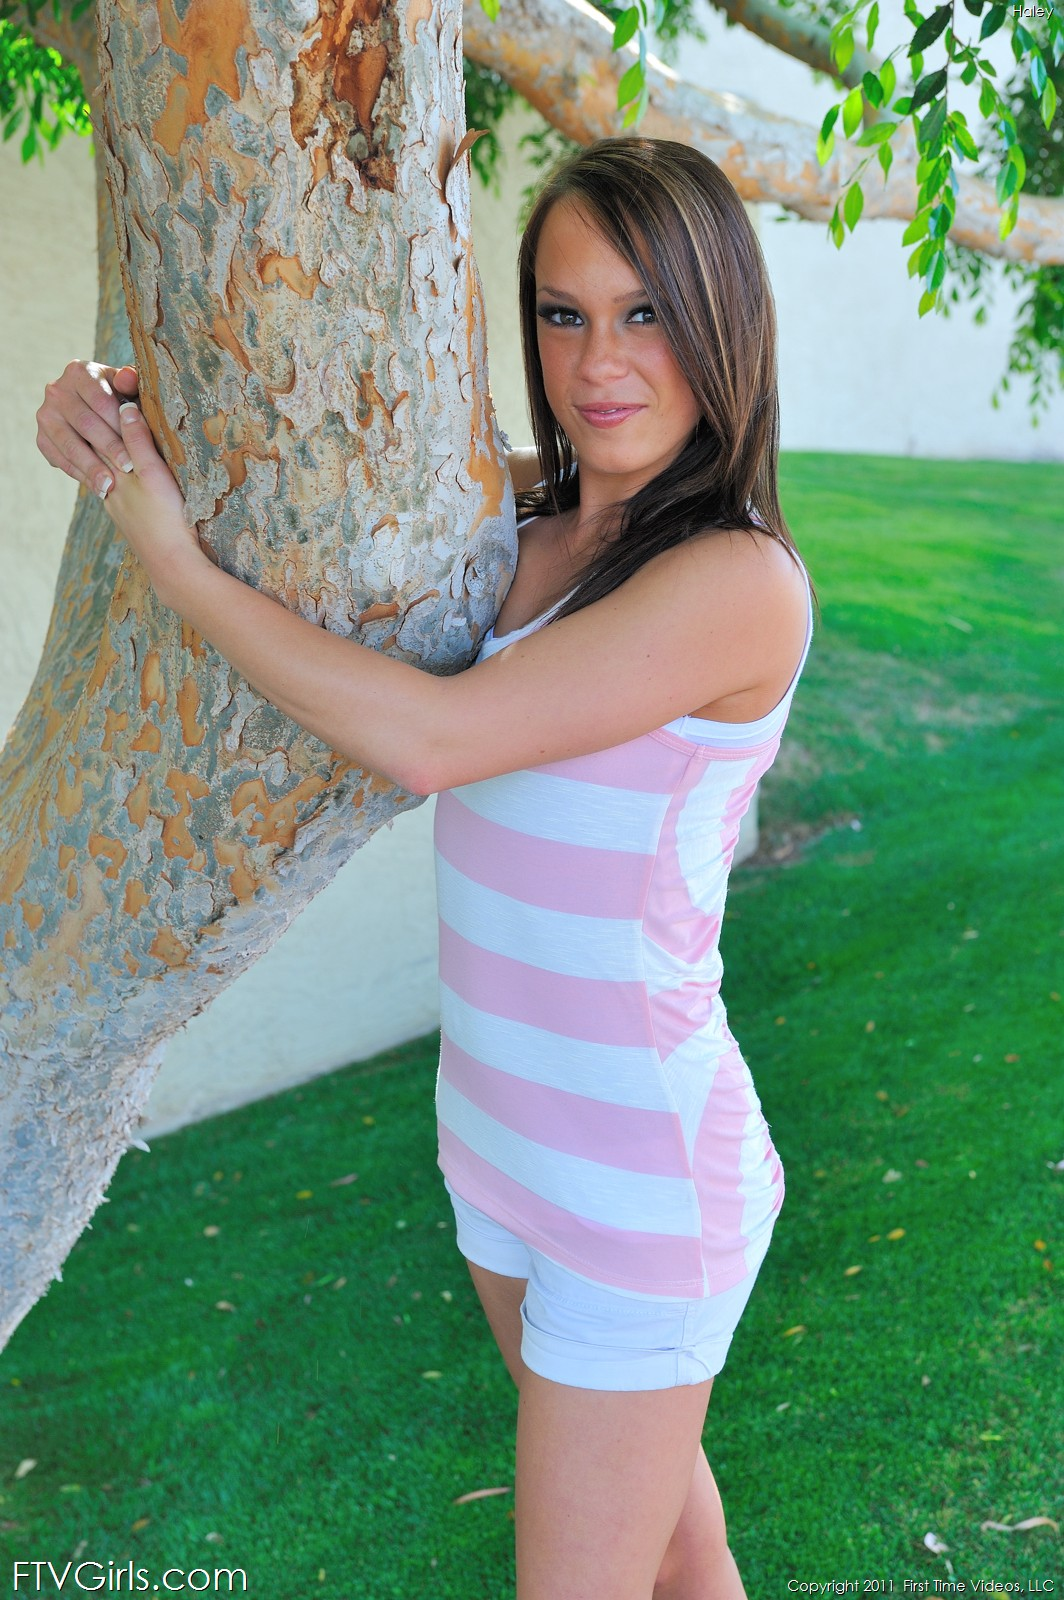 Ласковая красоточка Hayley Hanes игриво раздвигает свои булки и пизду на природе